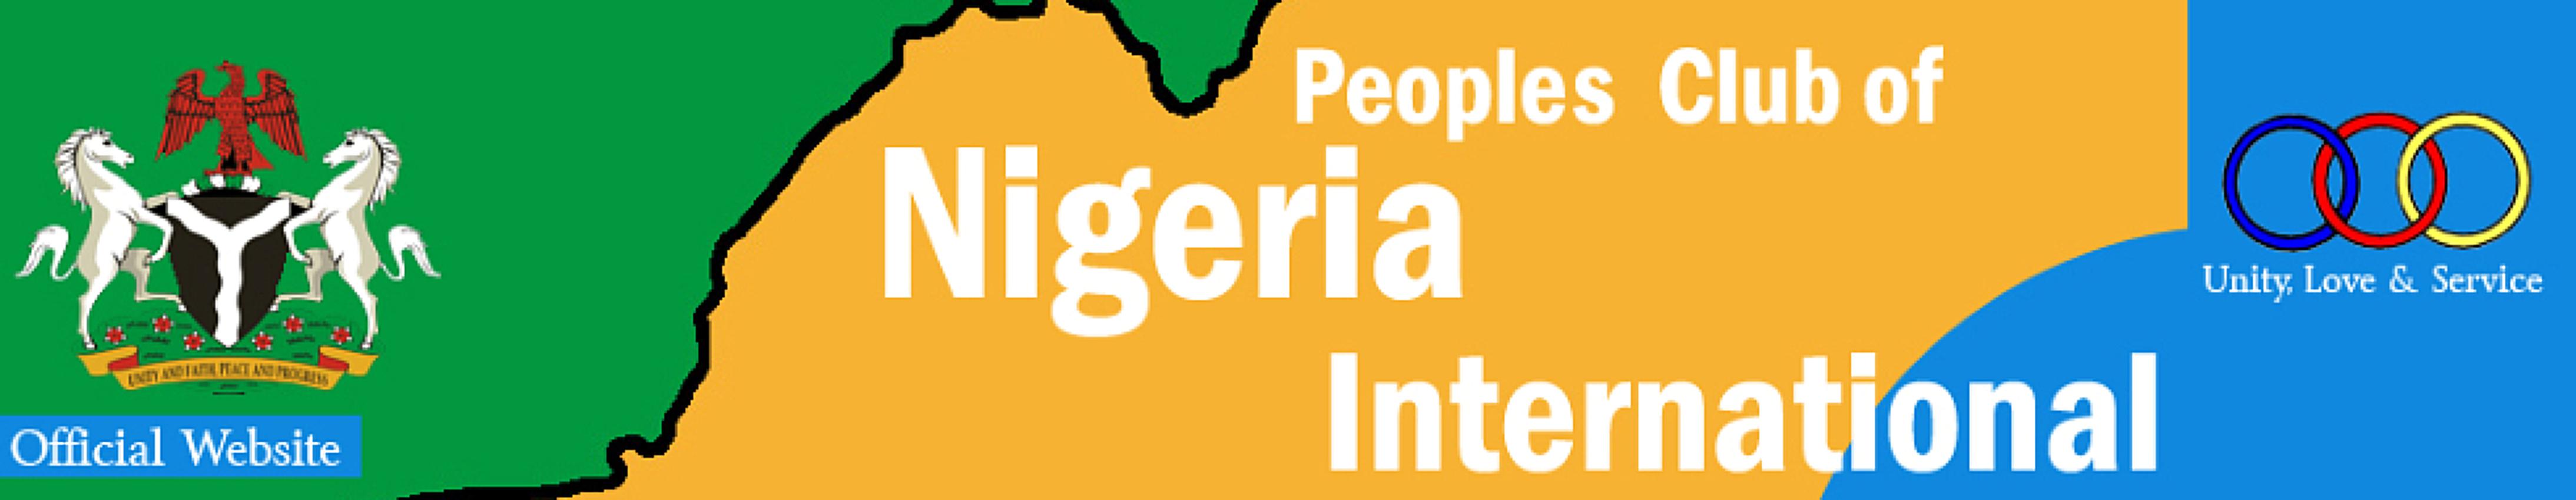 Peoples Club of Nigeria International